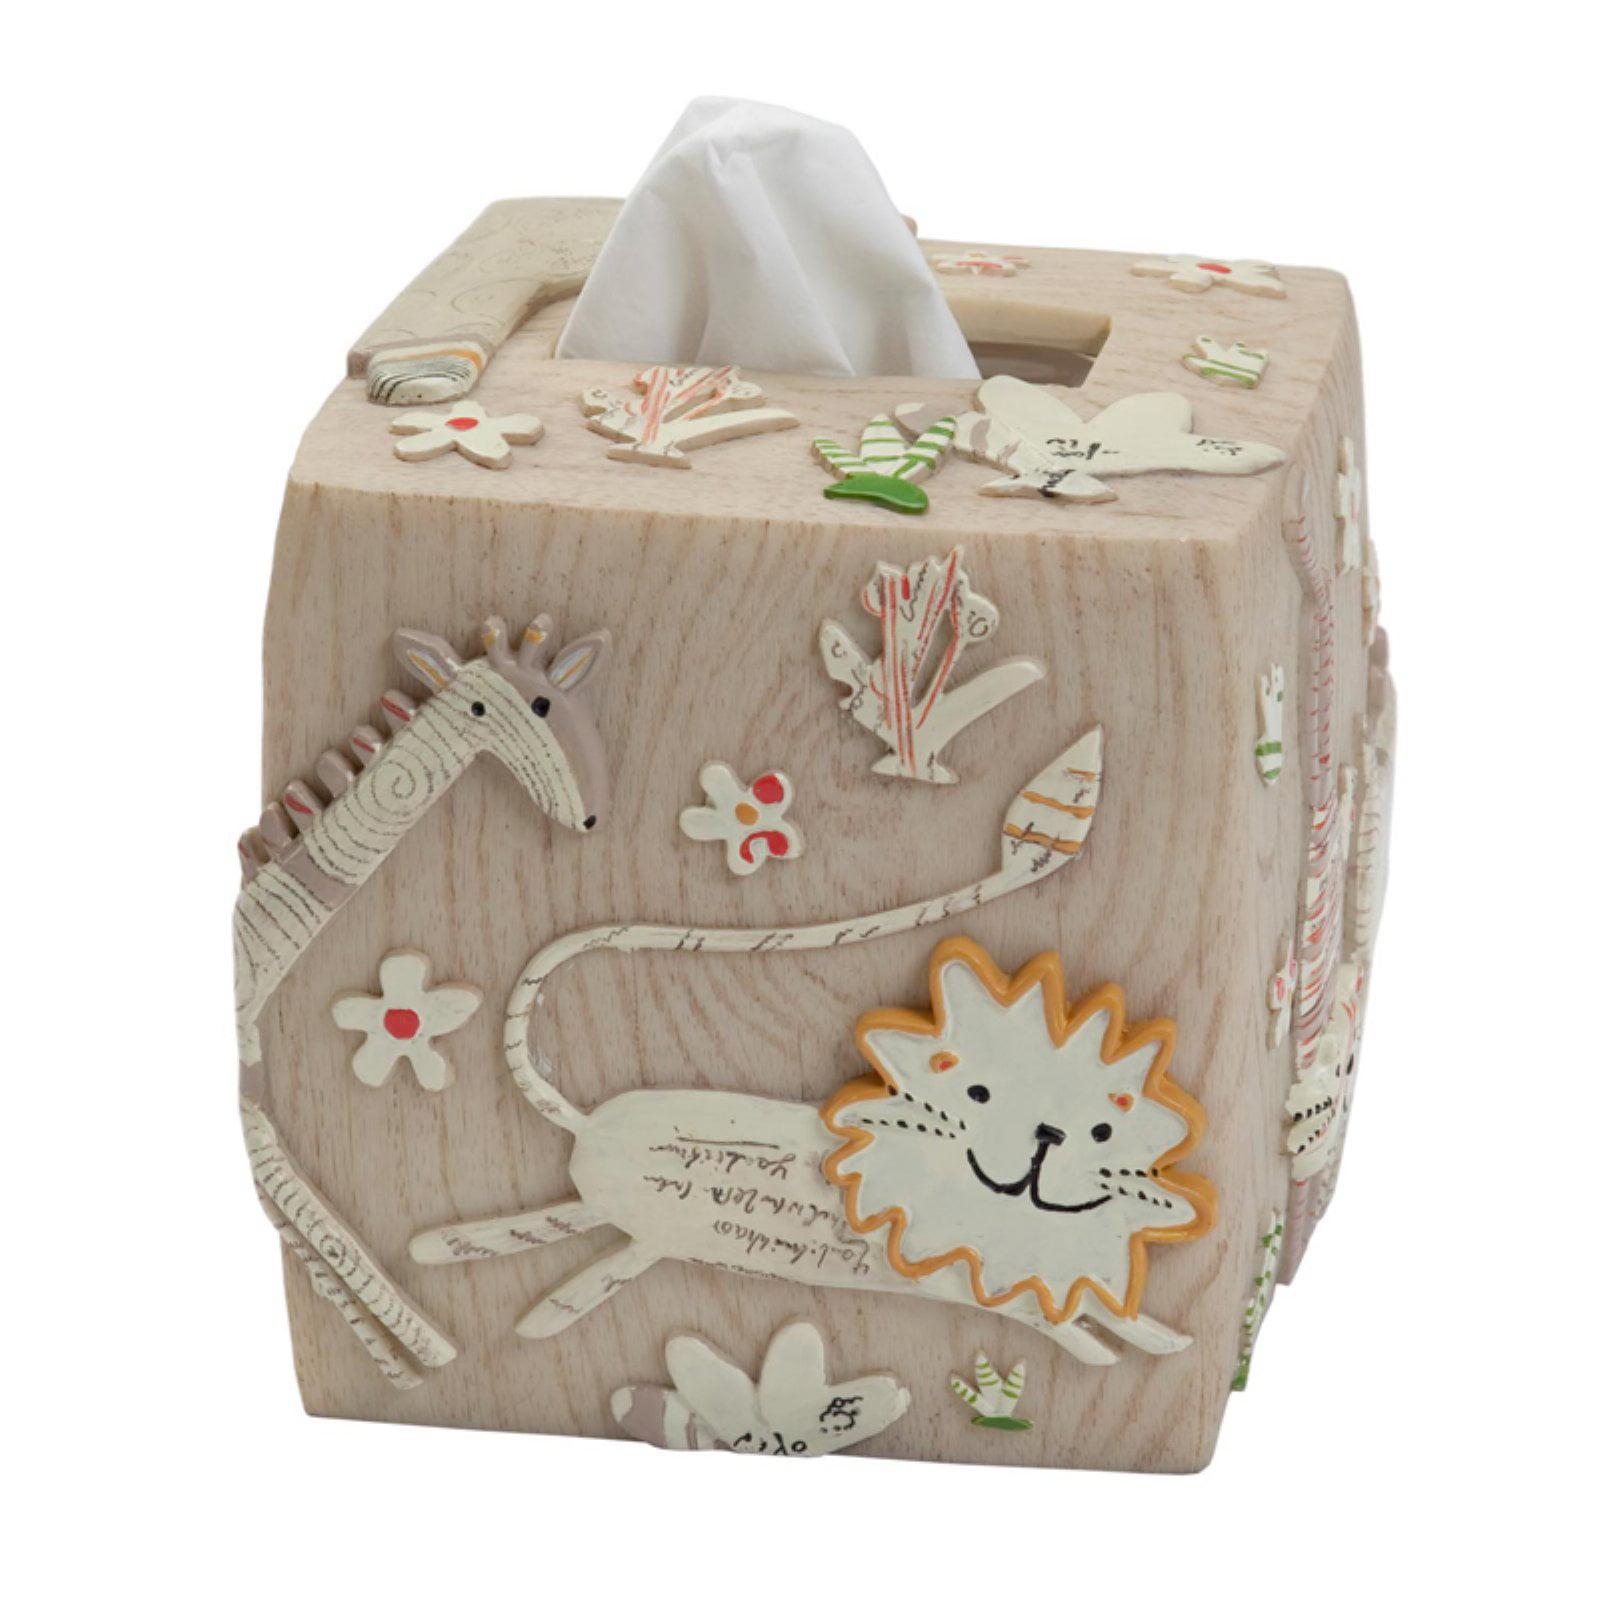 Animal Crackers Boutique Tissue